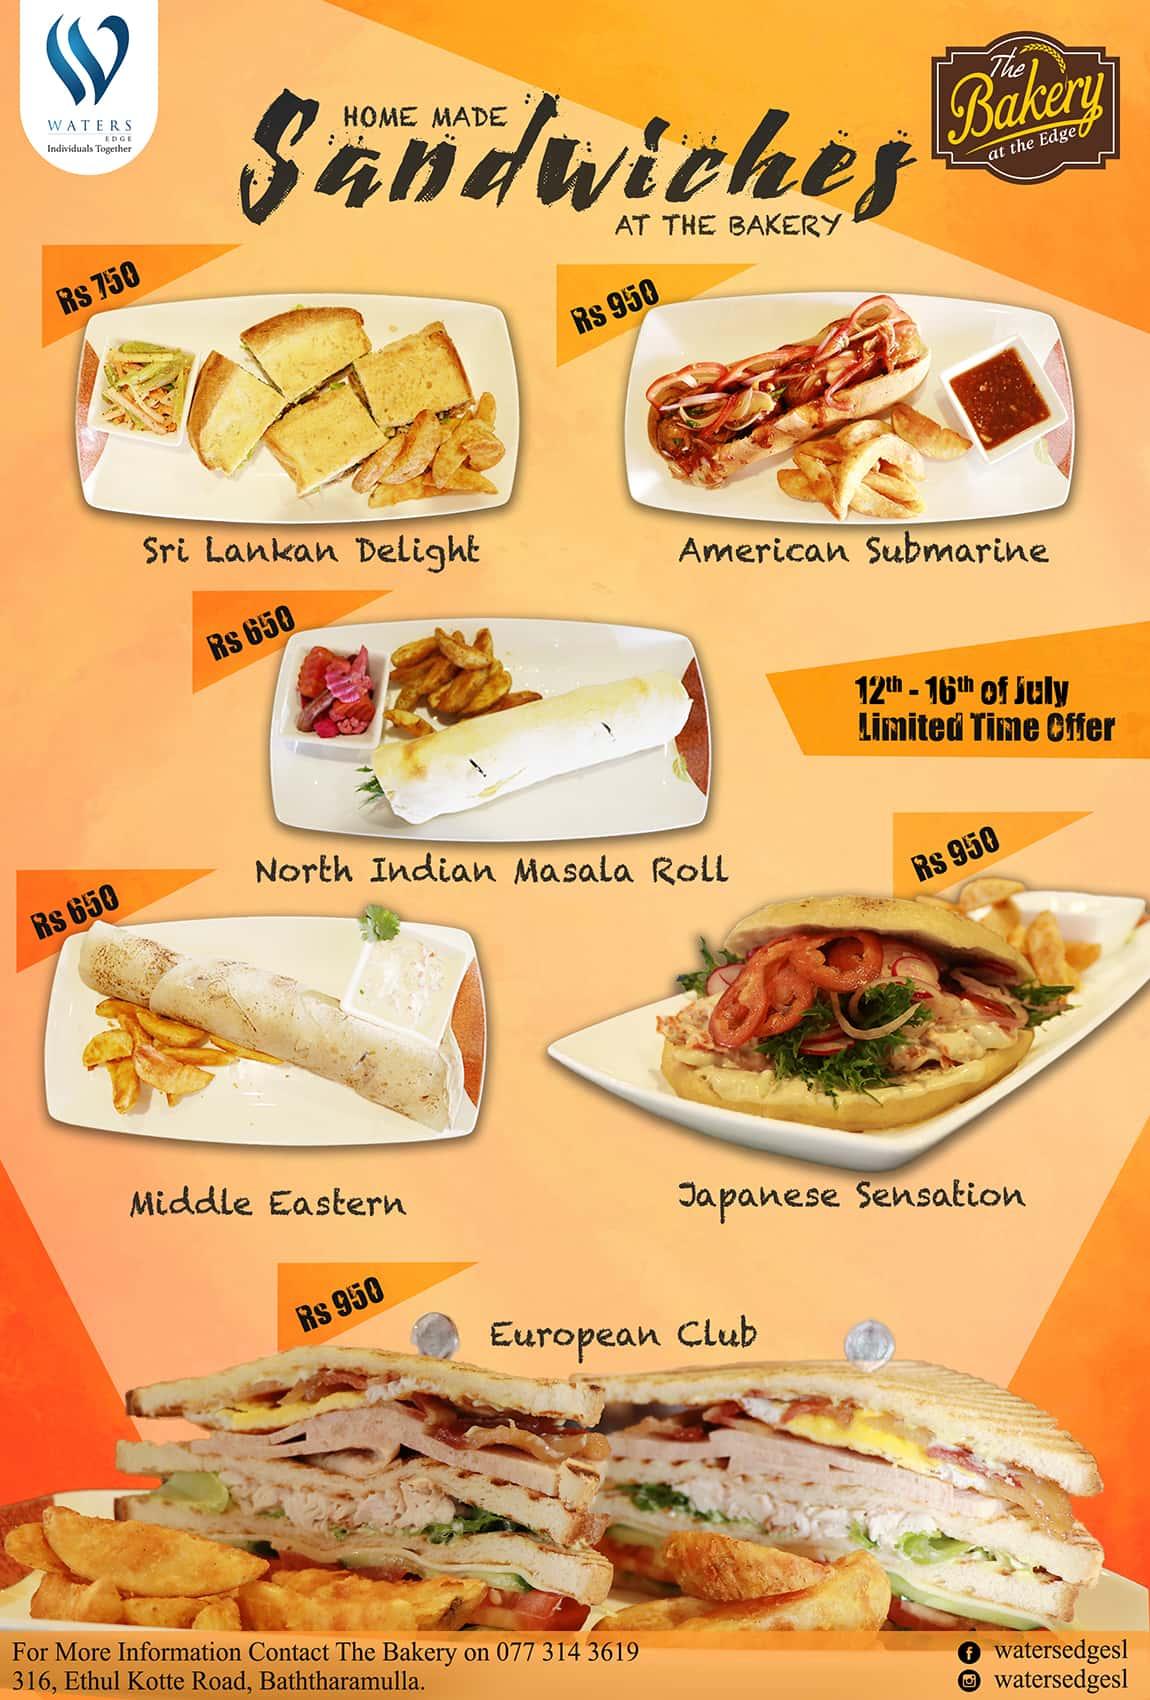 Bakery Sandwich Promotion